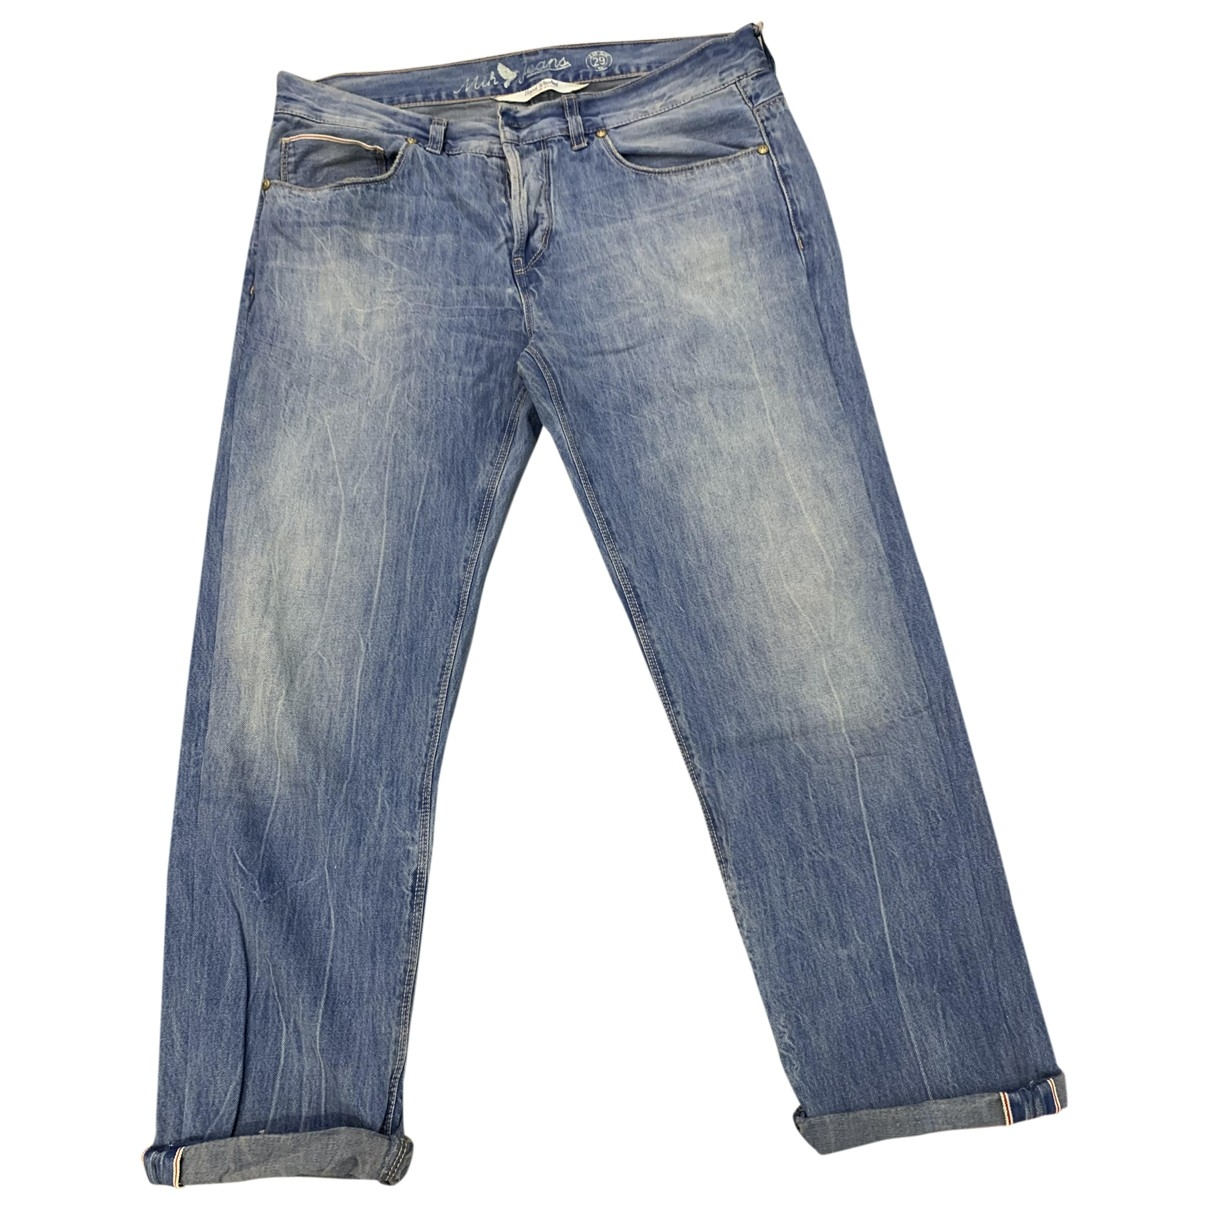 Mih Jeans \N Blue Denim - Jeans Jeans for Women 29 US